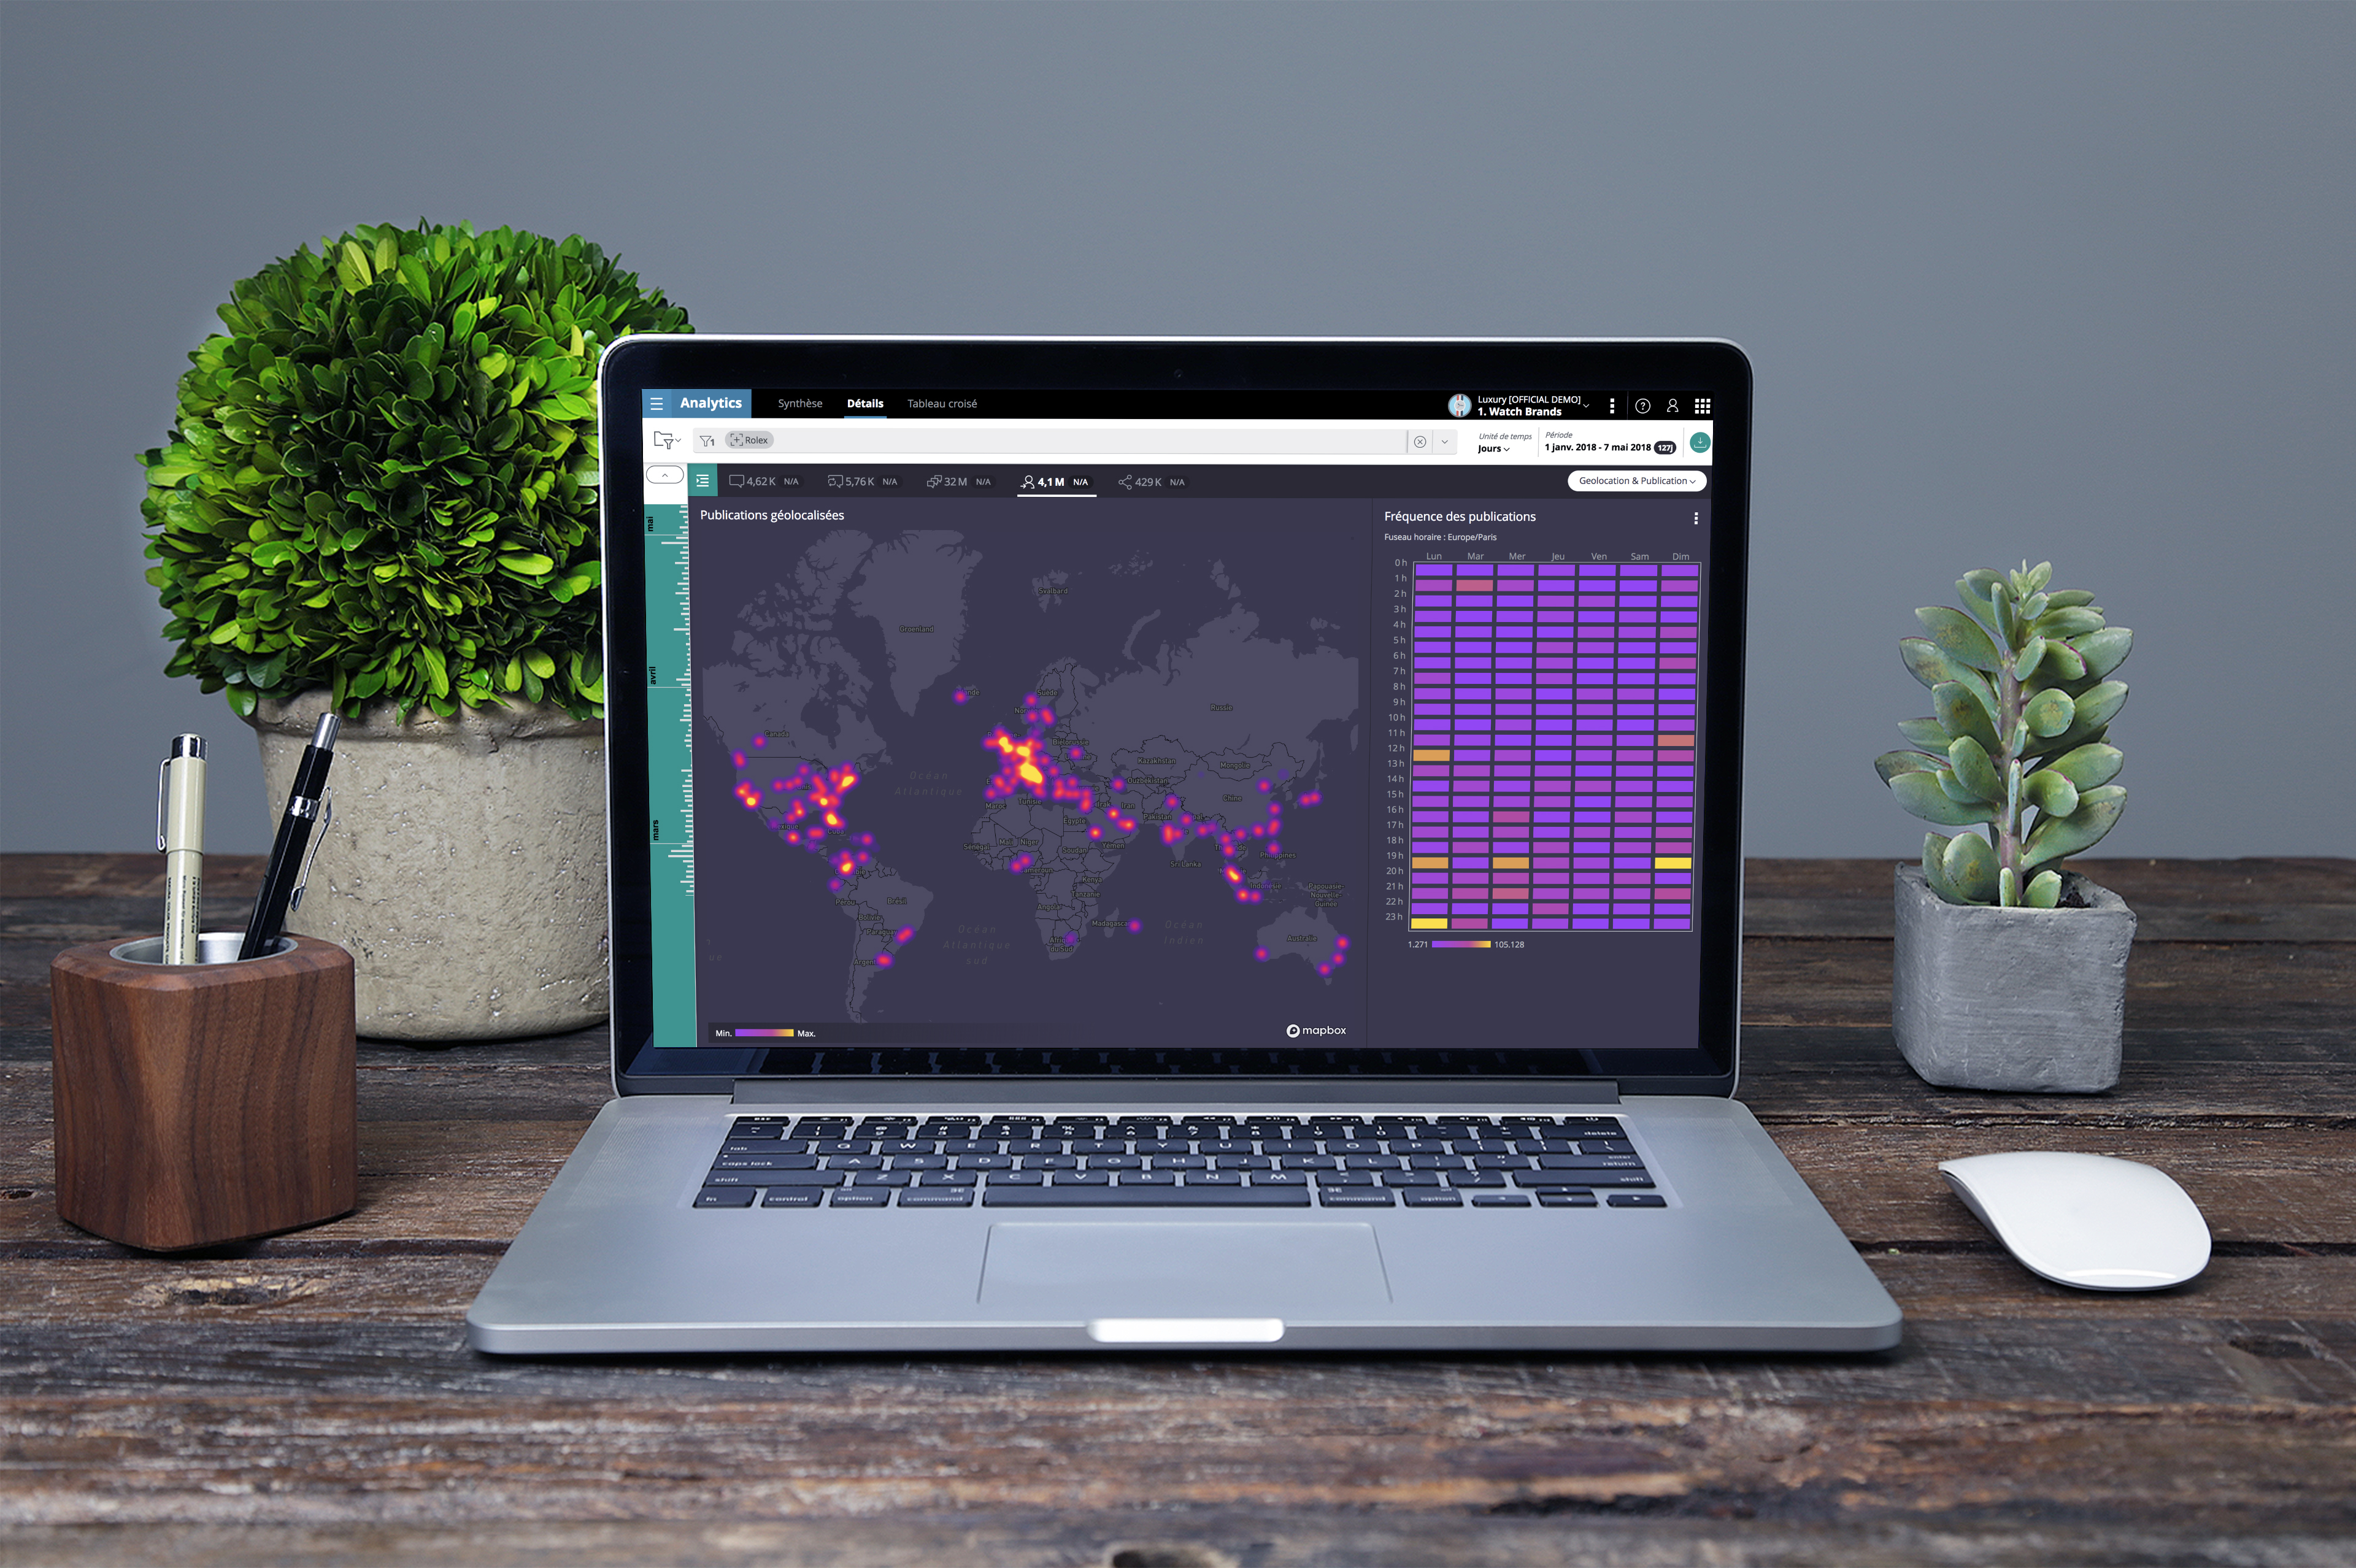 Radarly Demo - Radarly - geofencing